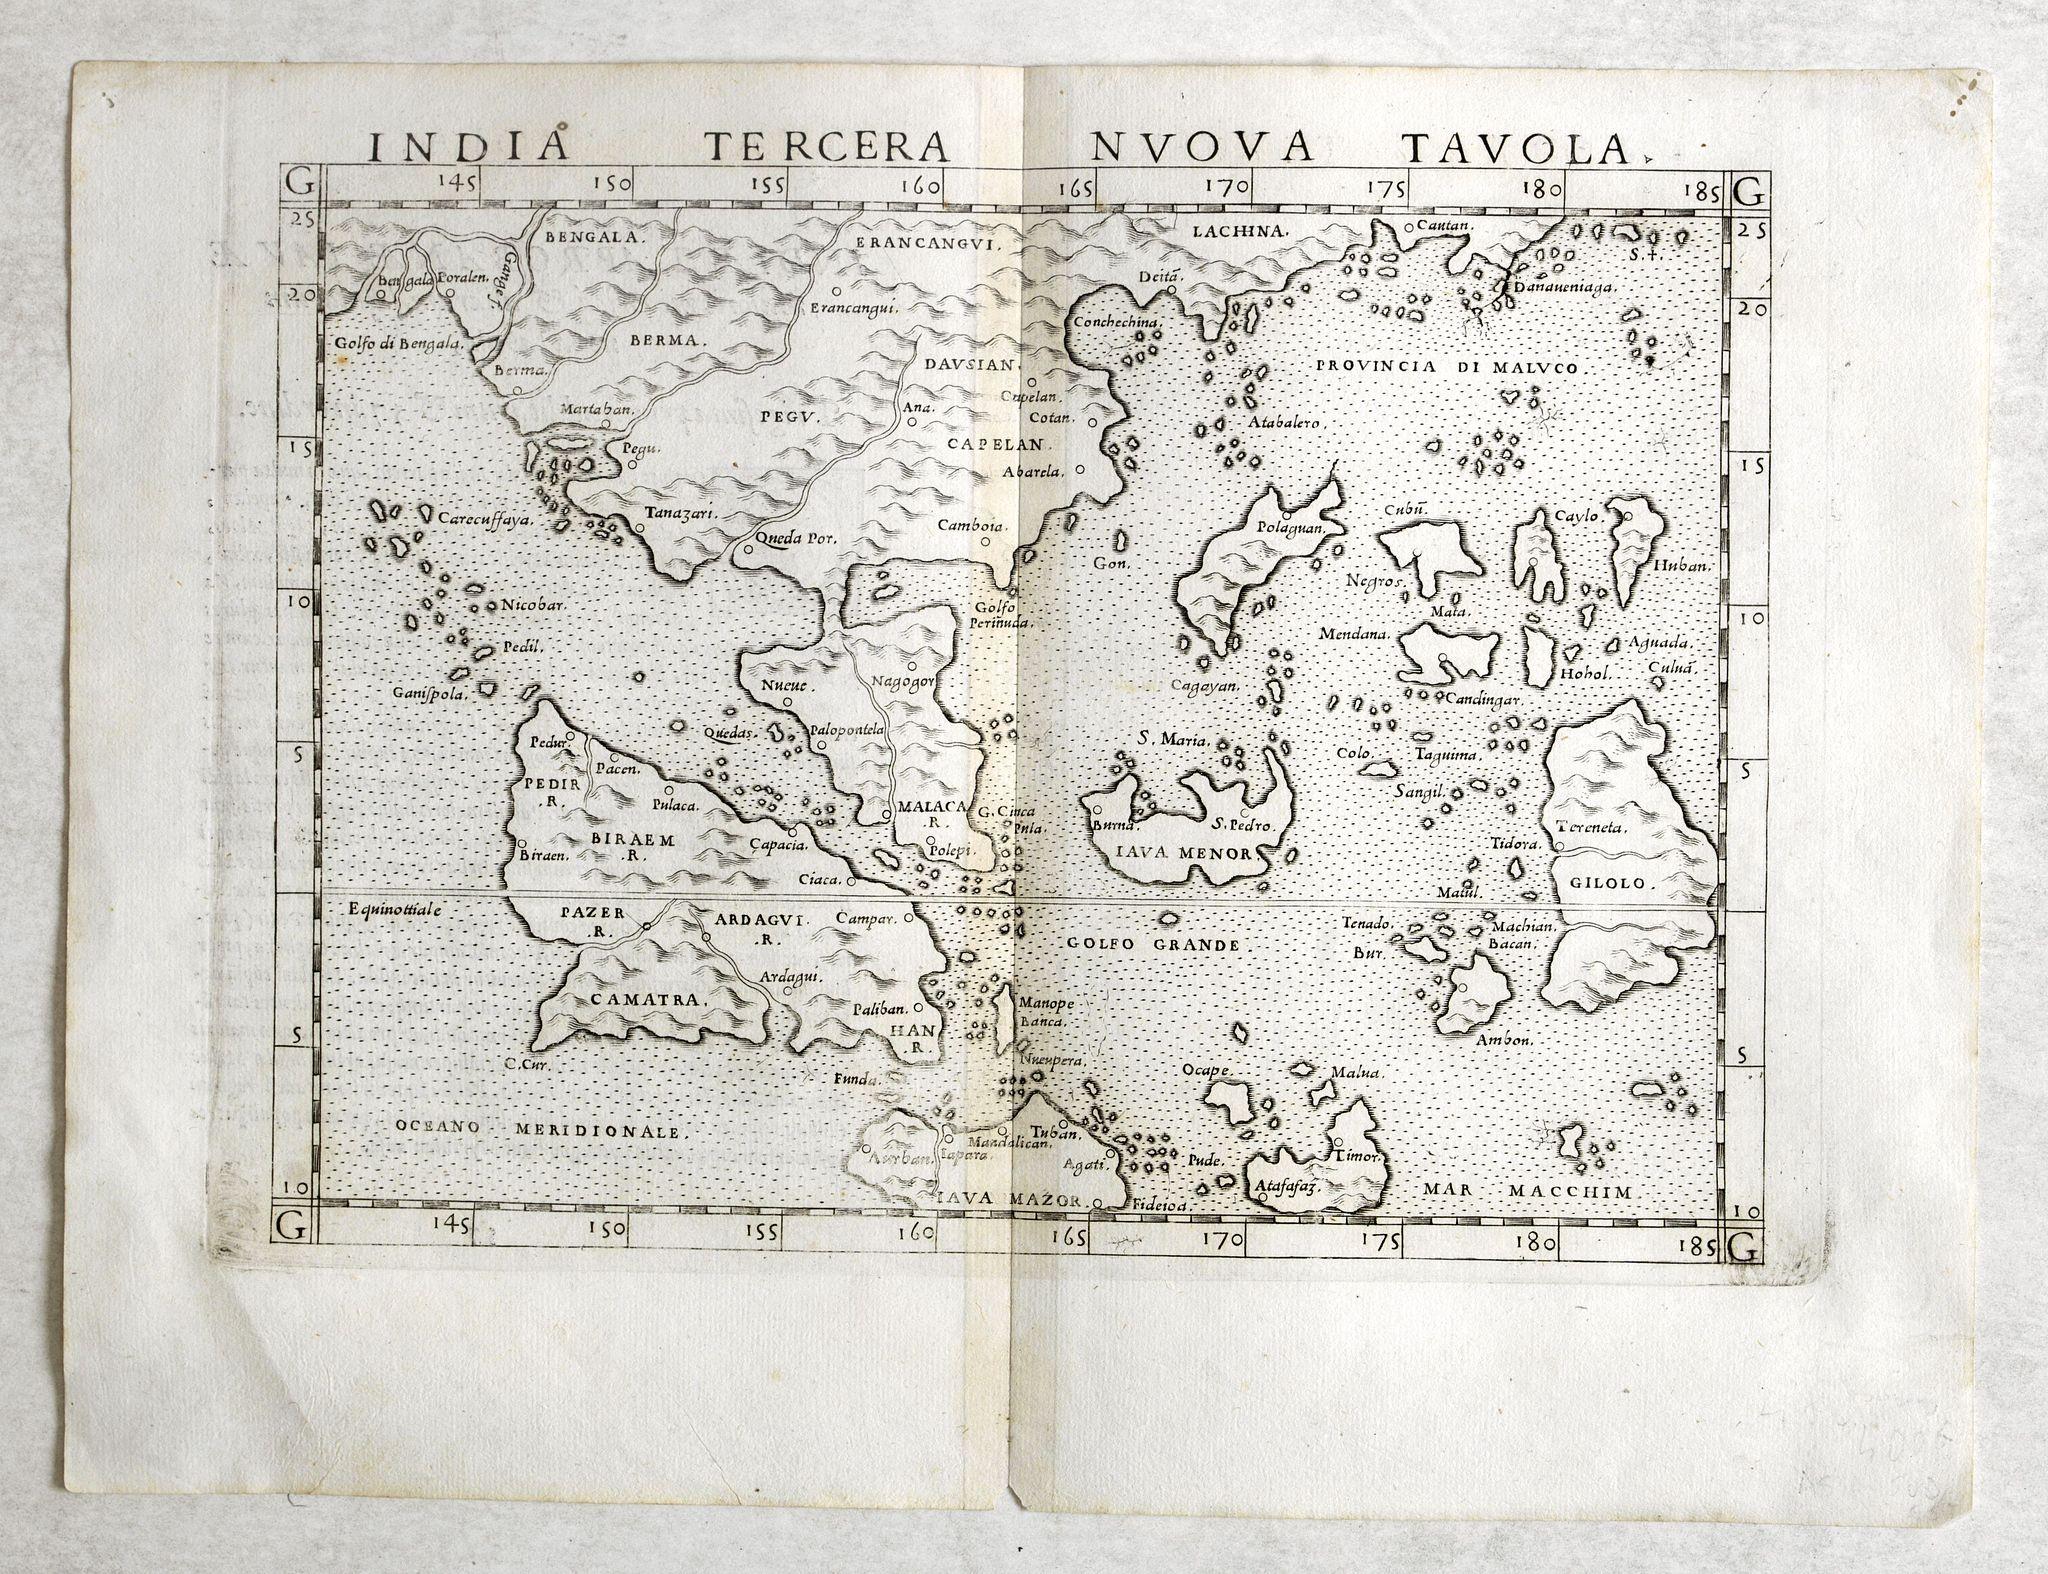 RUSCELLI, G. -  India Tercera Nuova Tavola.